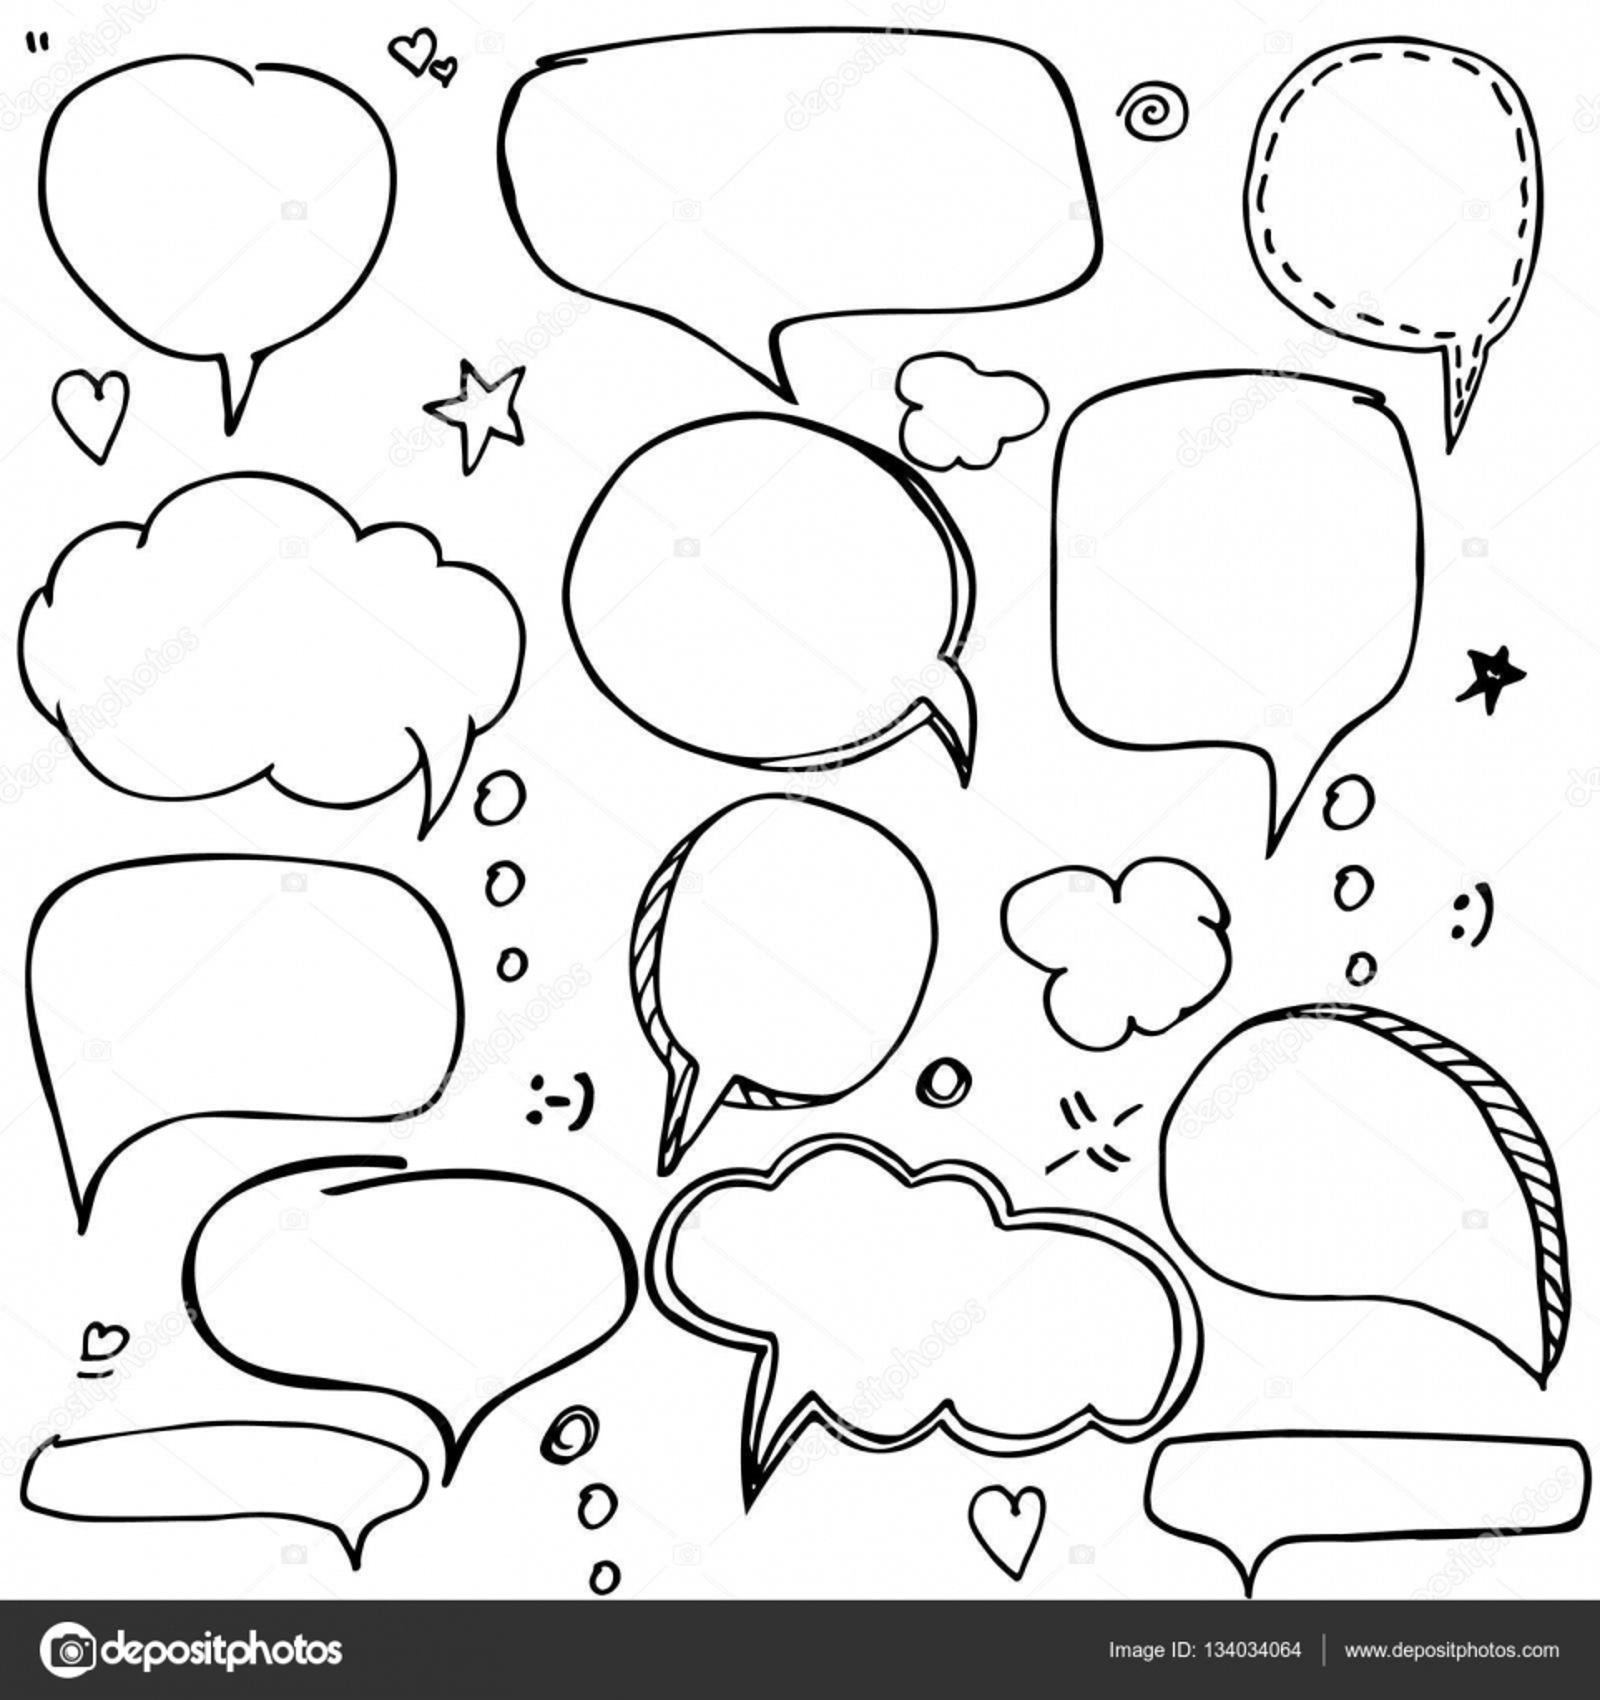 Set of hand drawn think and talk speech bubbles with love message set of hand drawn think and talk speech bubbles with love message greetings and sale m4hsunfo